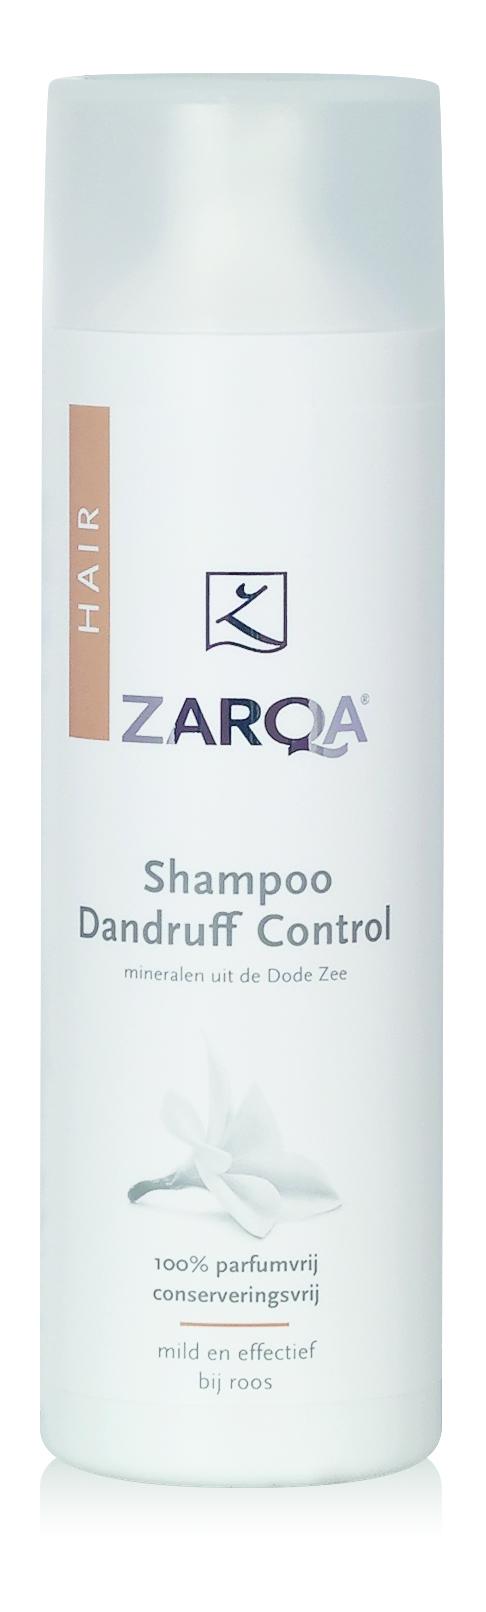 shampoo dandruff-Dode Zee